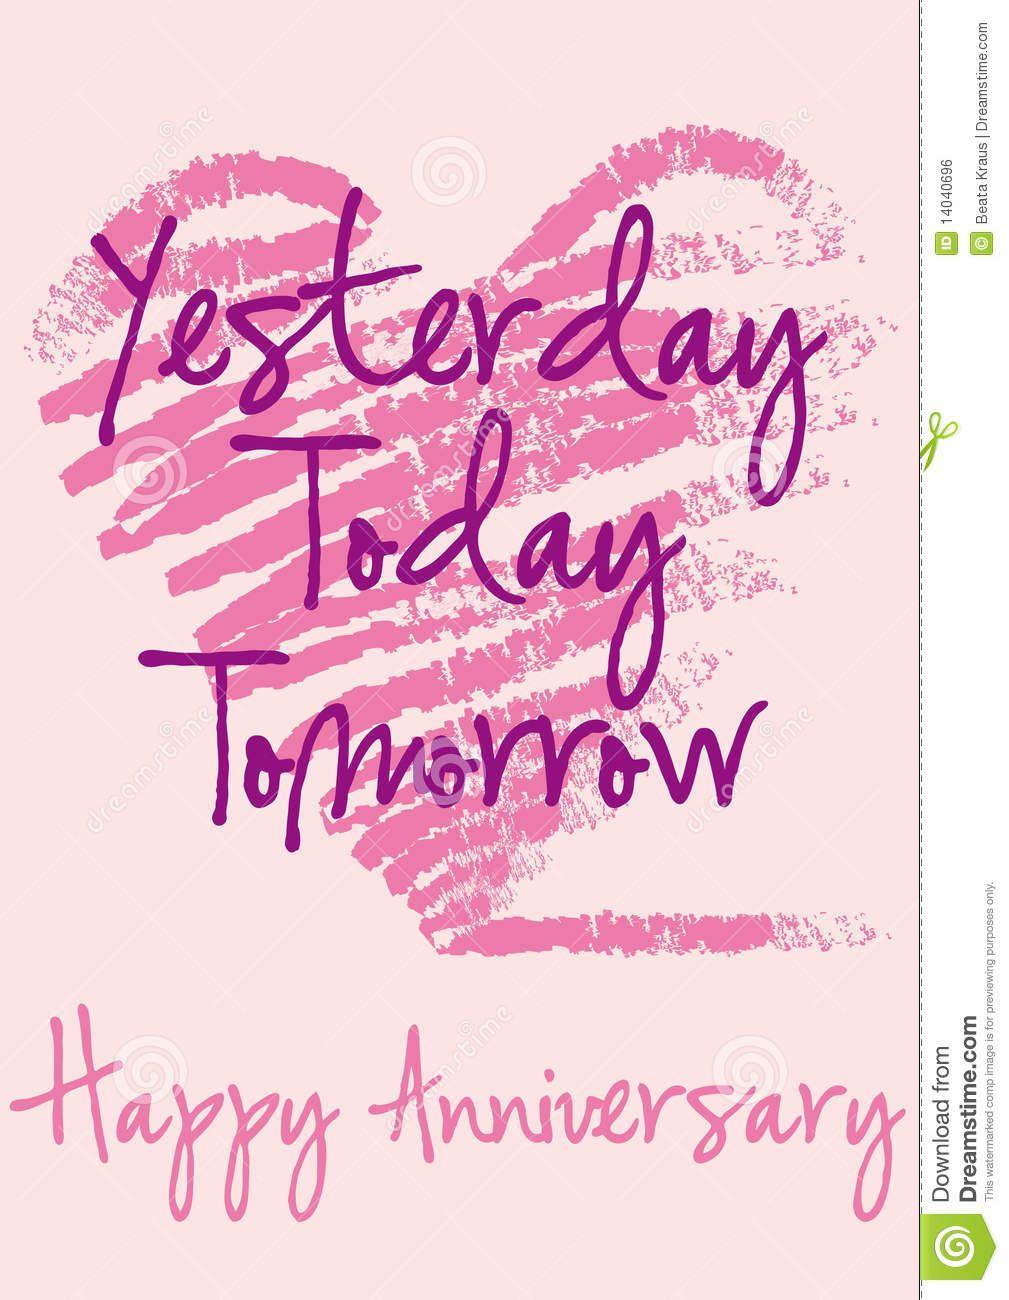 Happy anniversary pics google search pinteres happy anniversary pics google search more voltagebd Choice Image